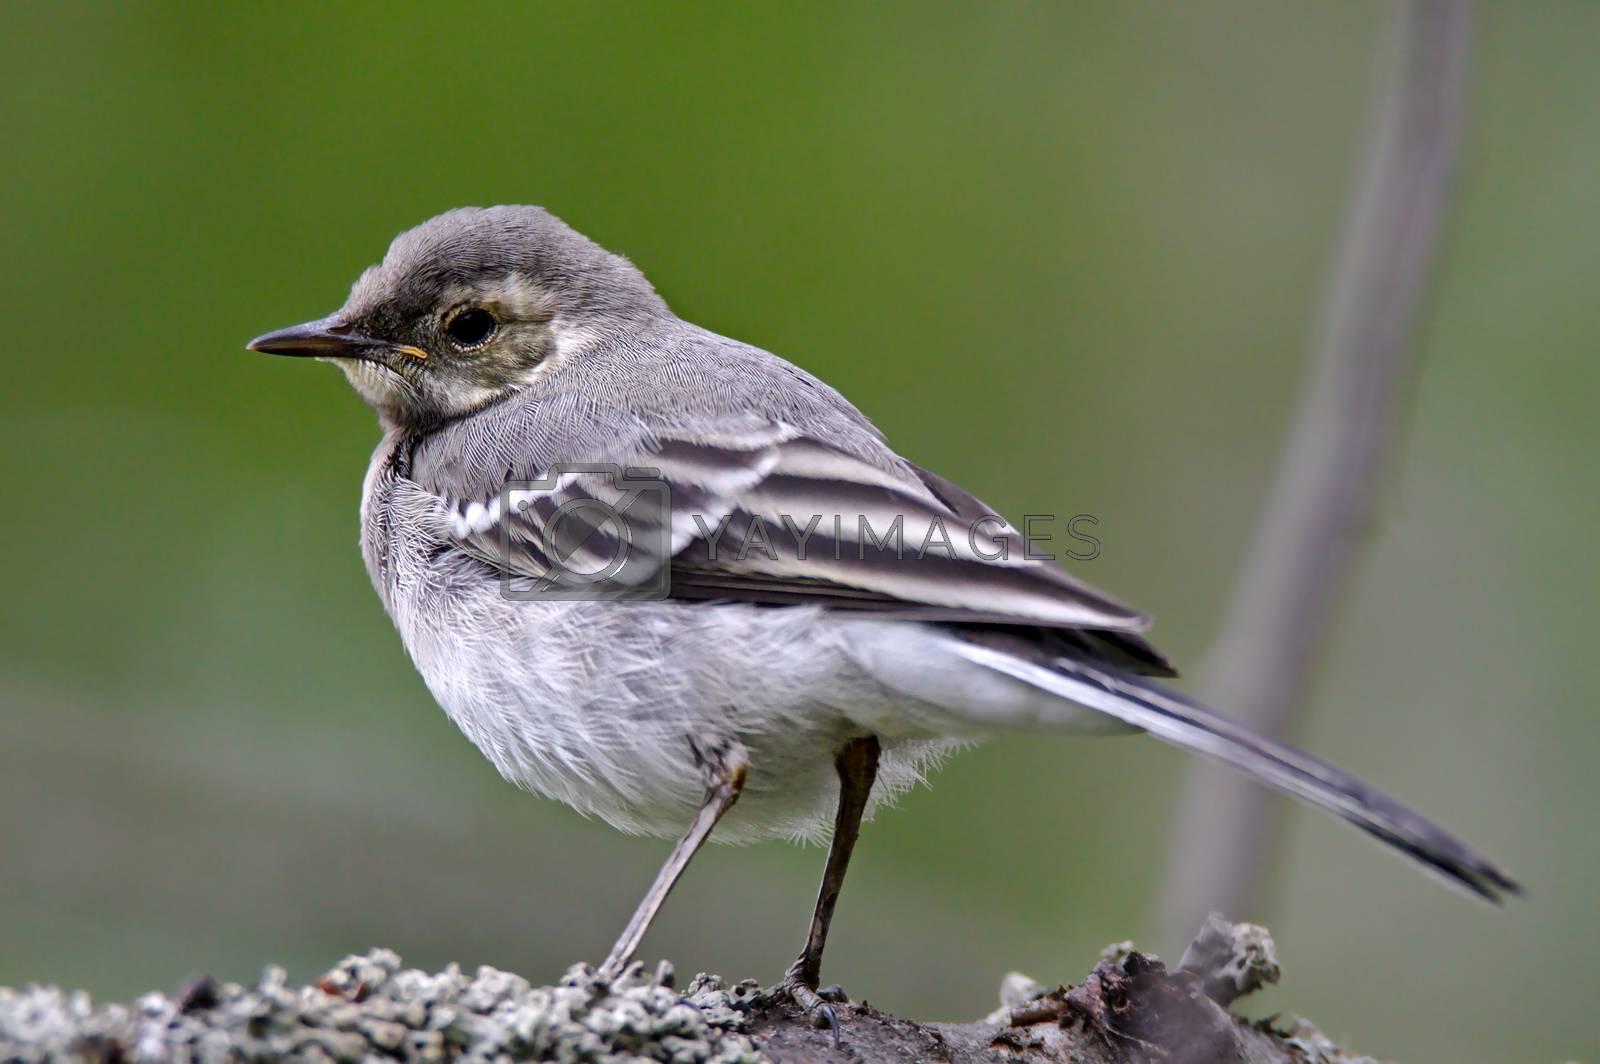 Small grey urban bird sitting on the branch.